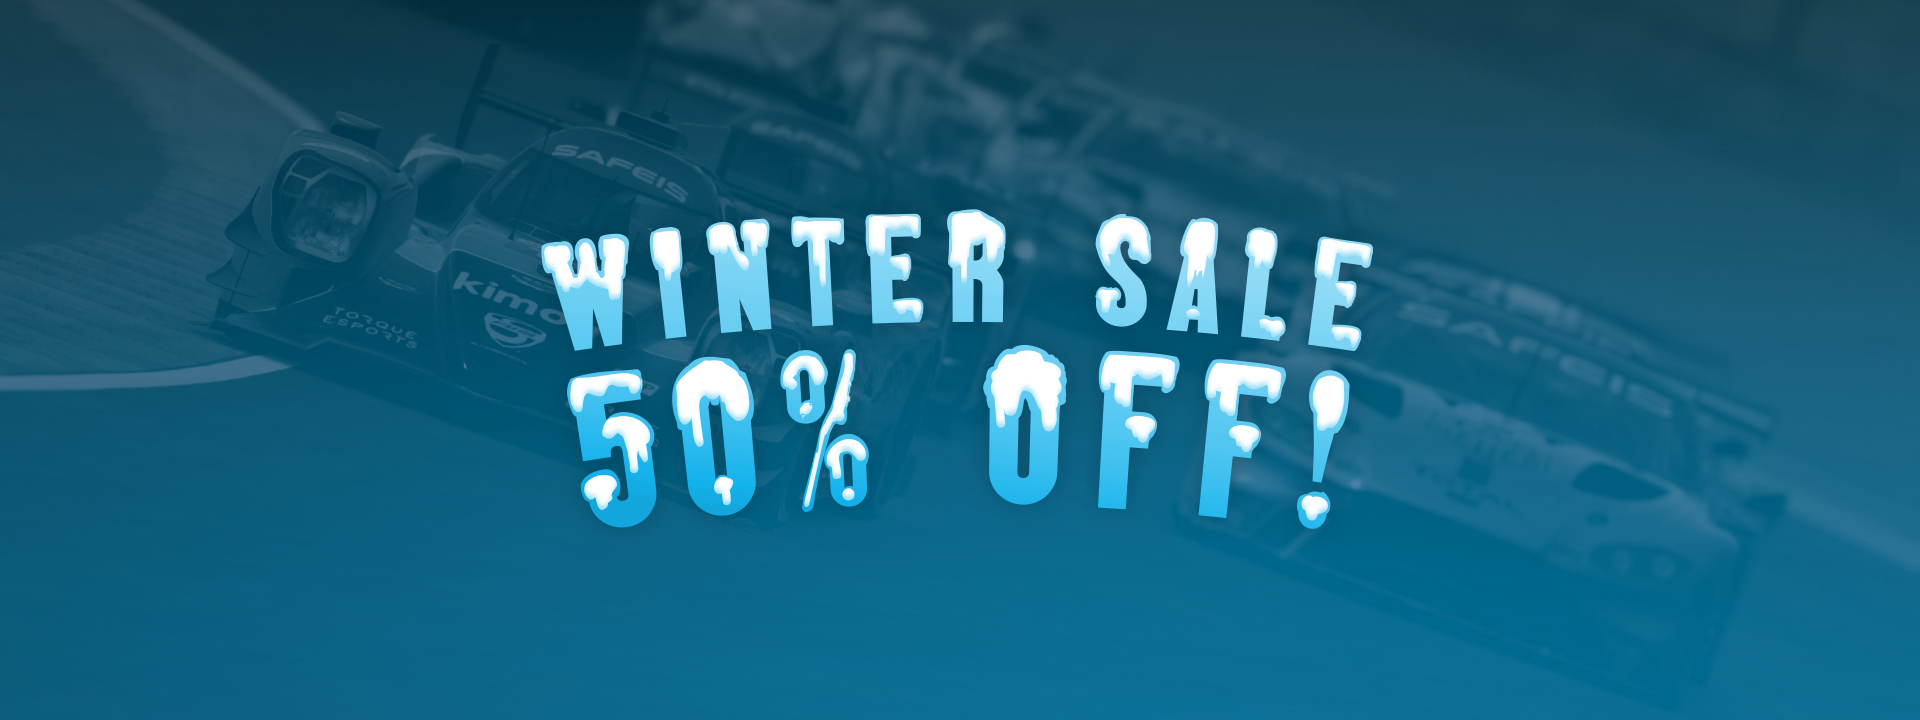 social_rf2_2020_winter-sale.png